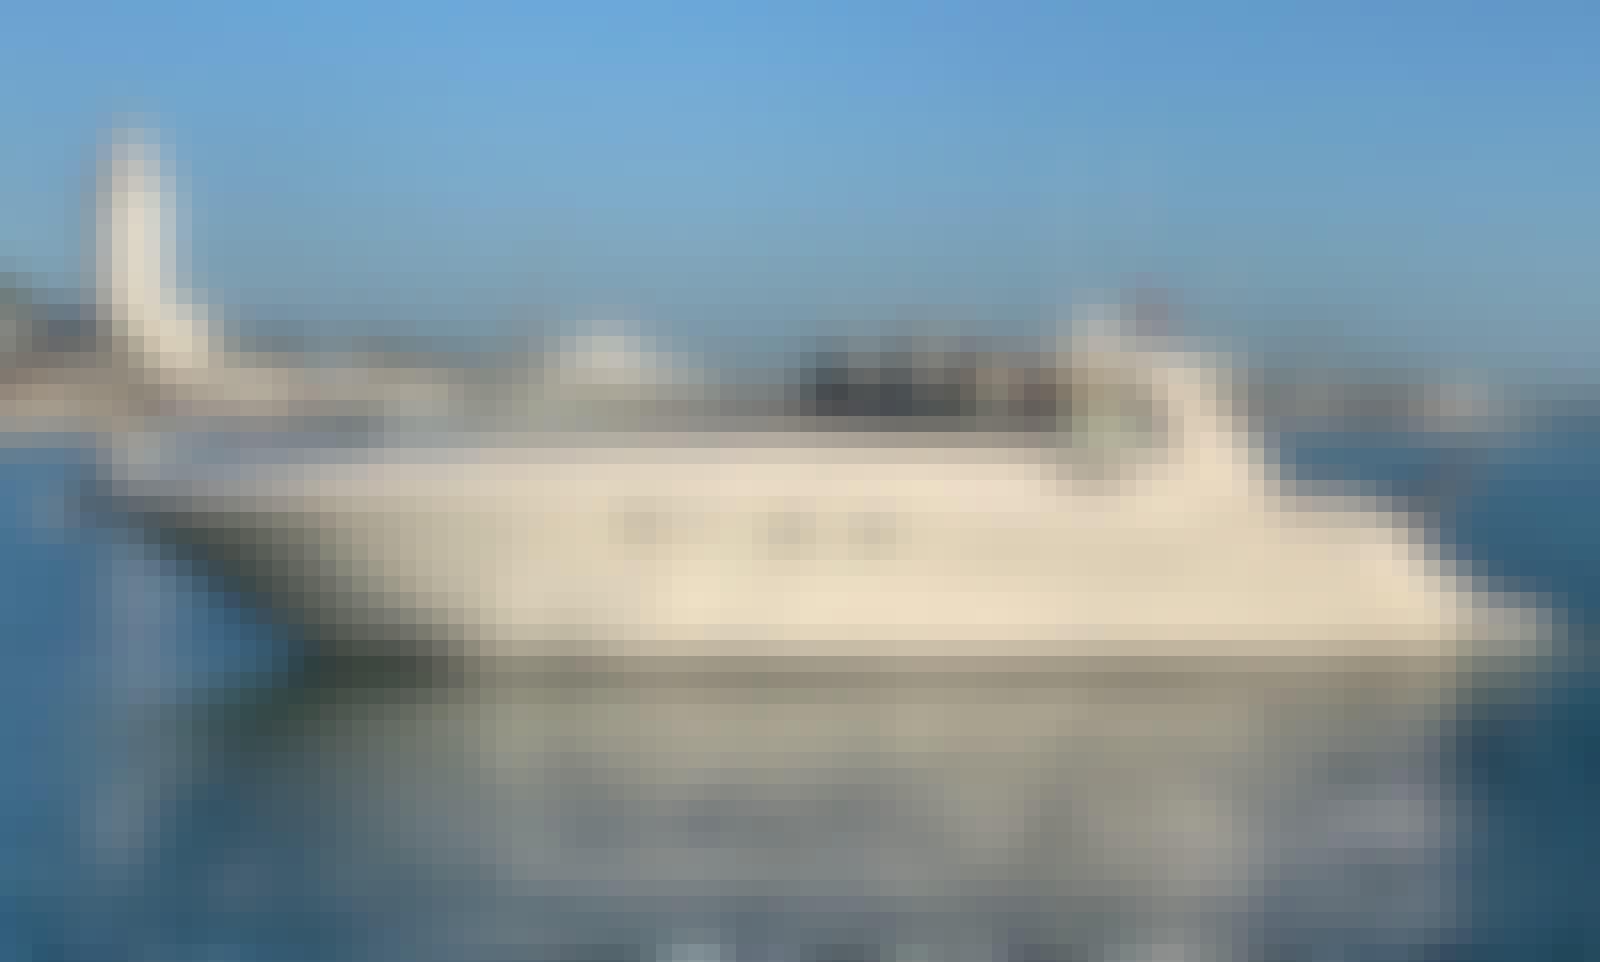 Charter the 51´ Sea Ray 510 Sundancer Yacht in Málaga City, gas included up to 40 miles!